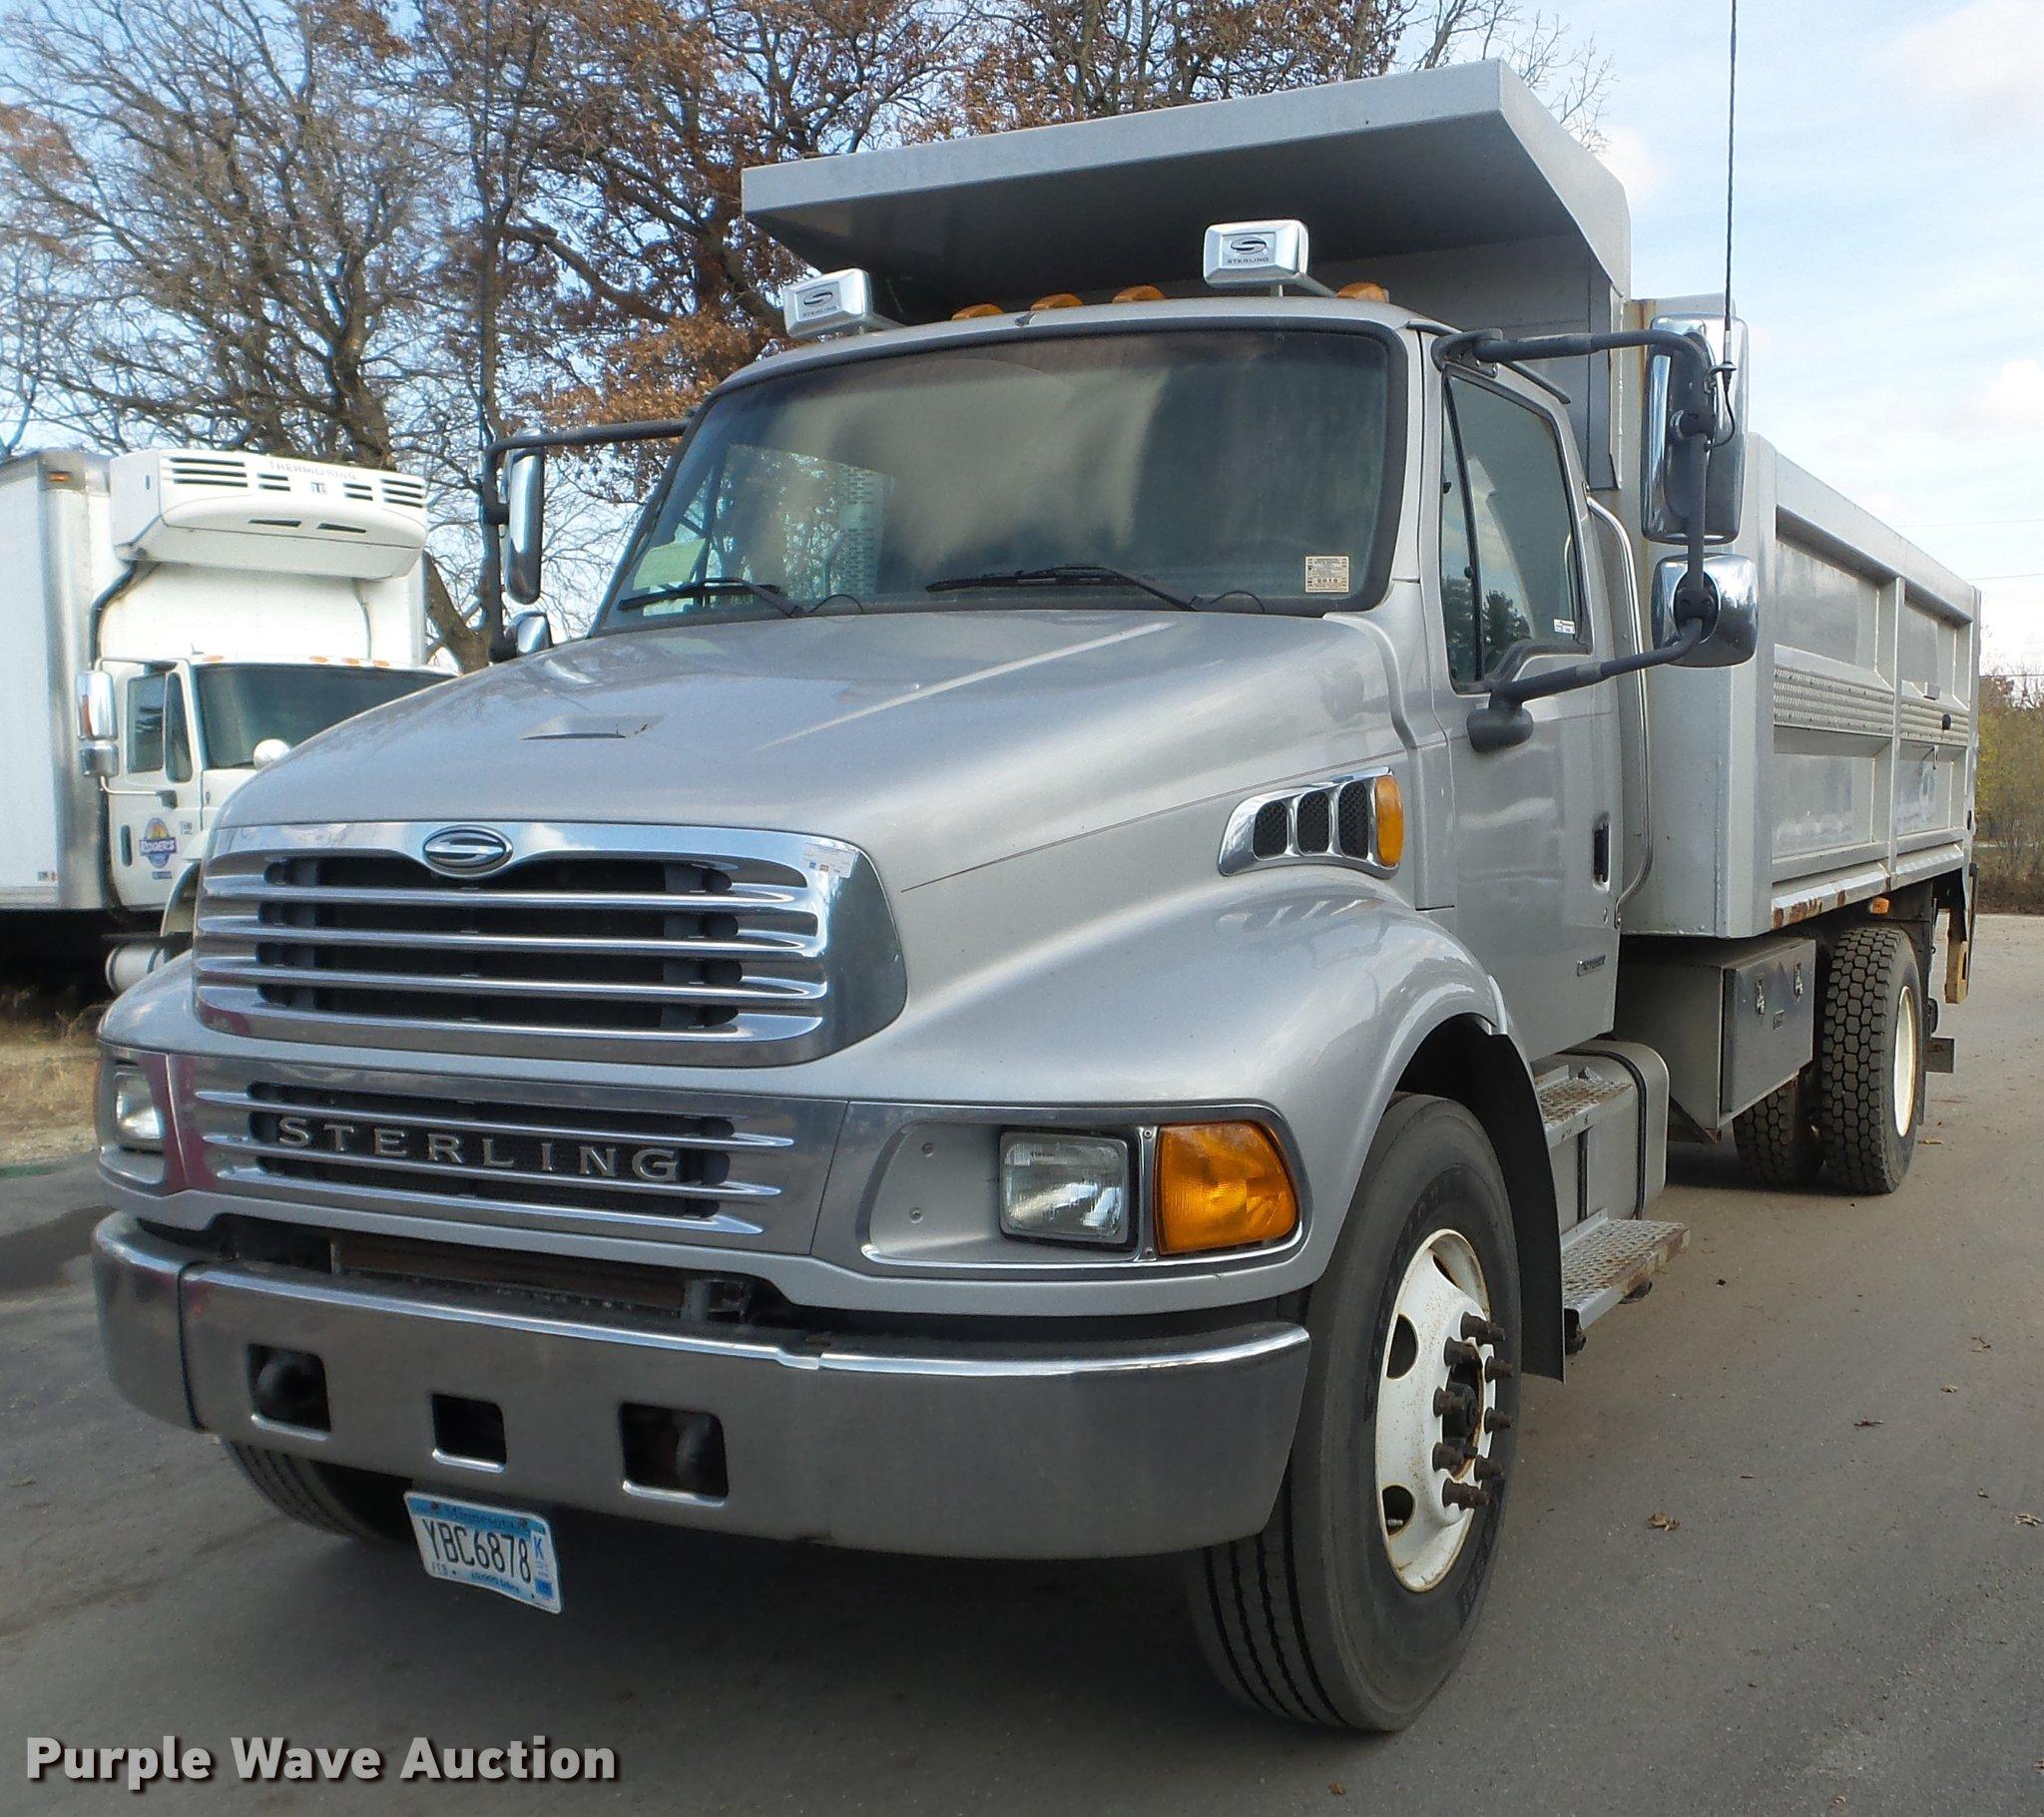 2007 Sterling Aceterra truck | Item DX9661 | Thursday Decemb